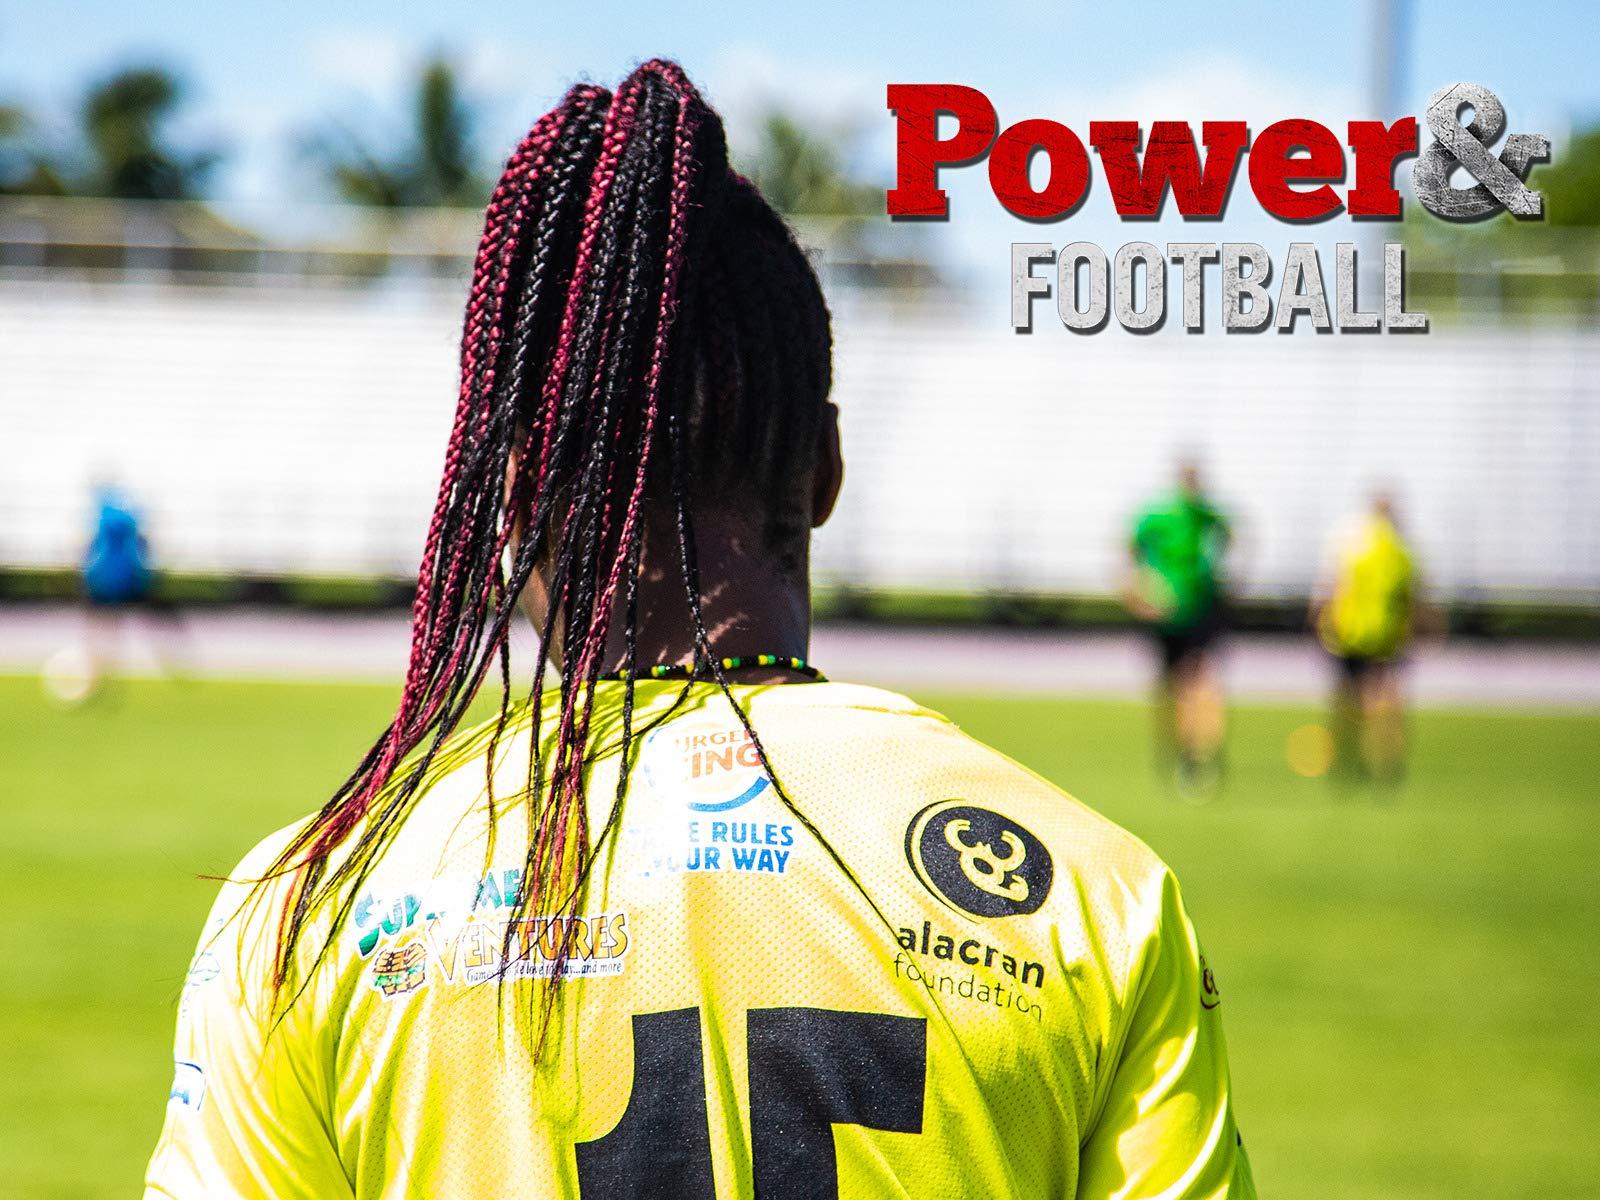 Power & Football